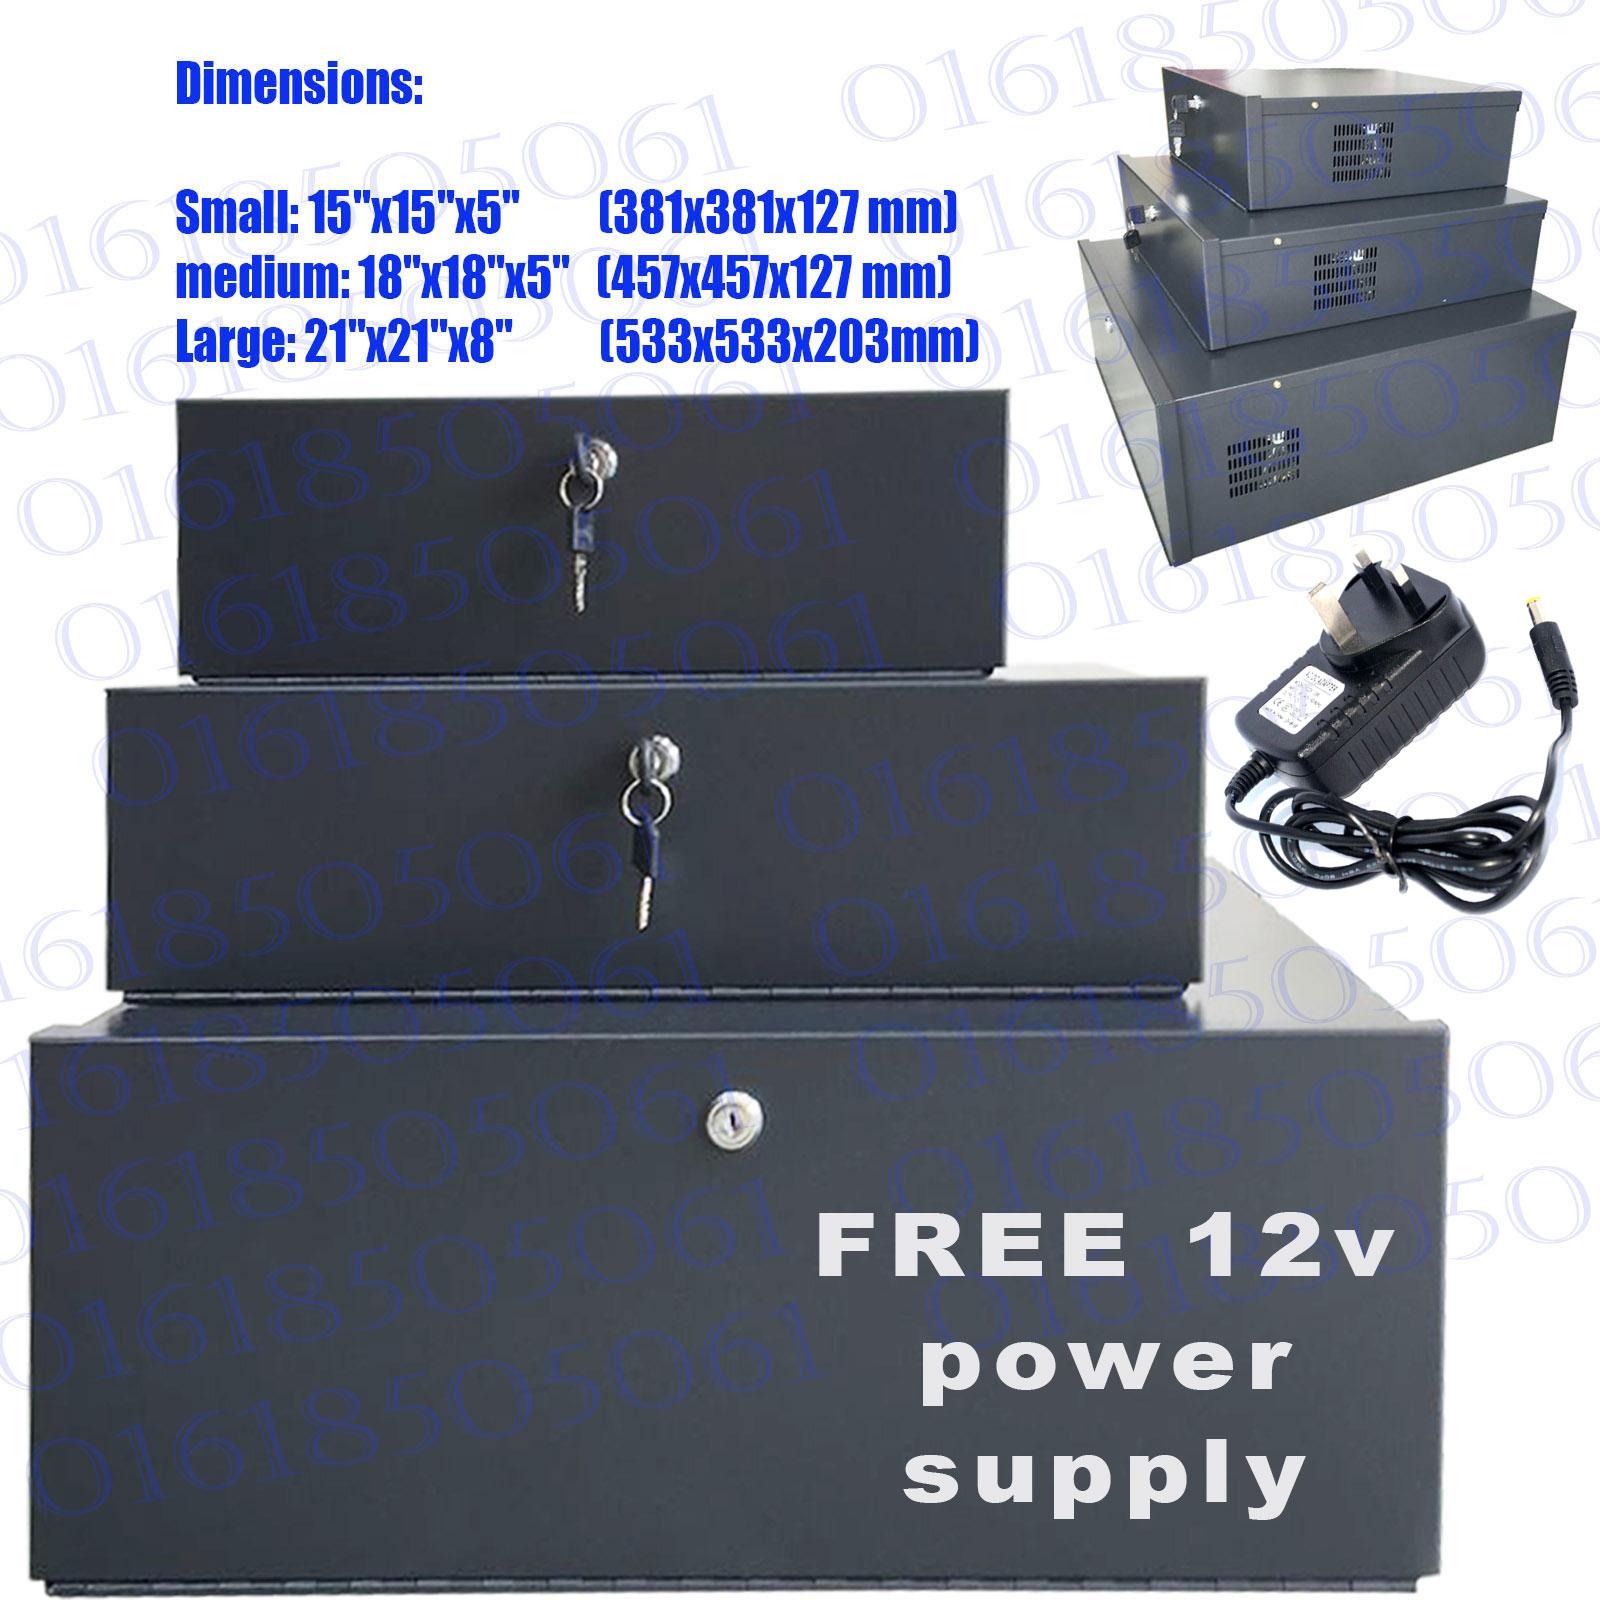 "Small CCTV DVR Lockable Safe Box Heavy Duty DVR Protection 15"" X 15"" X 5"""